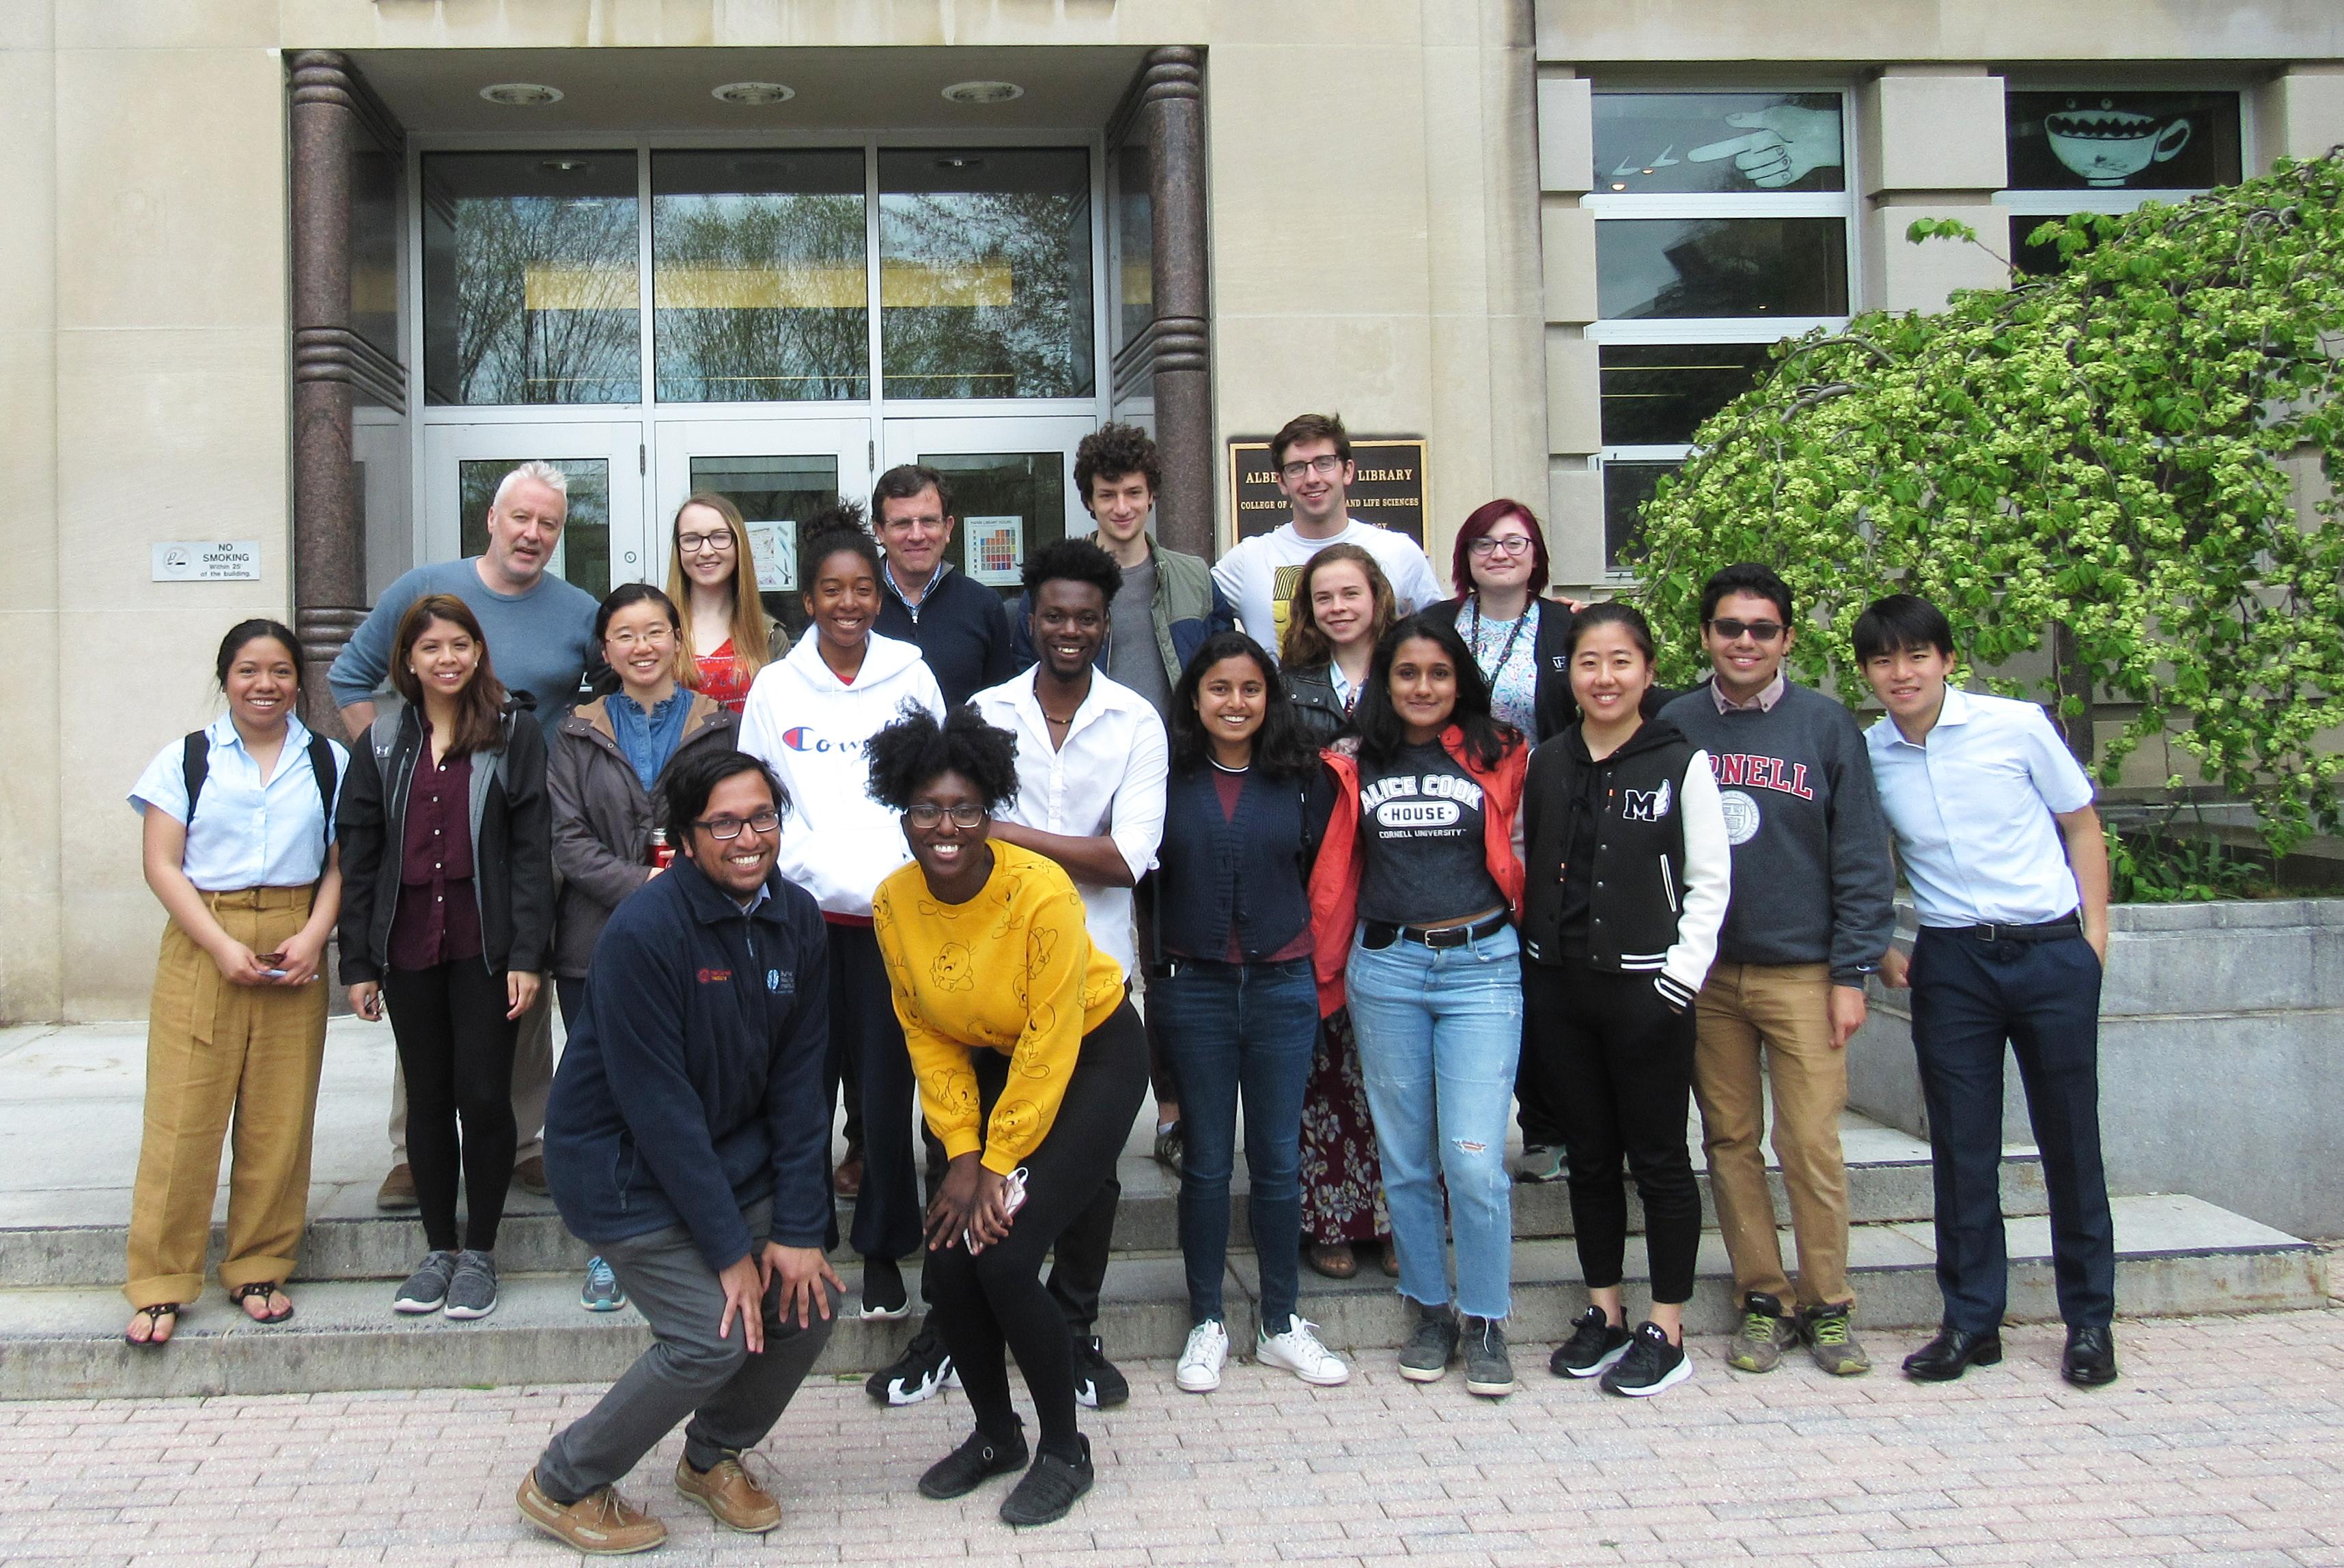 2019 class reunion in Ithaca